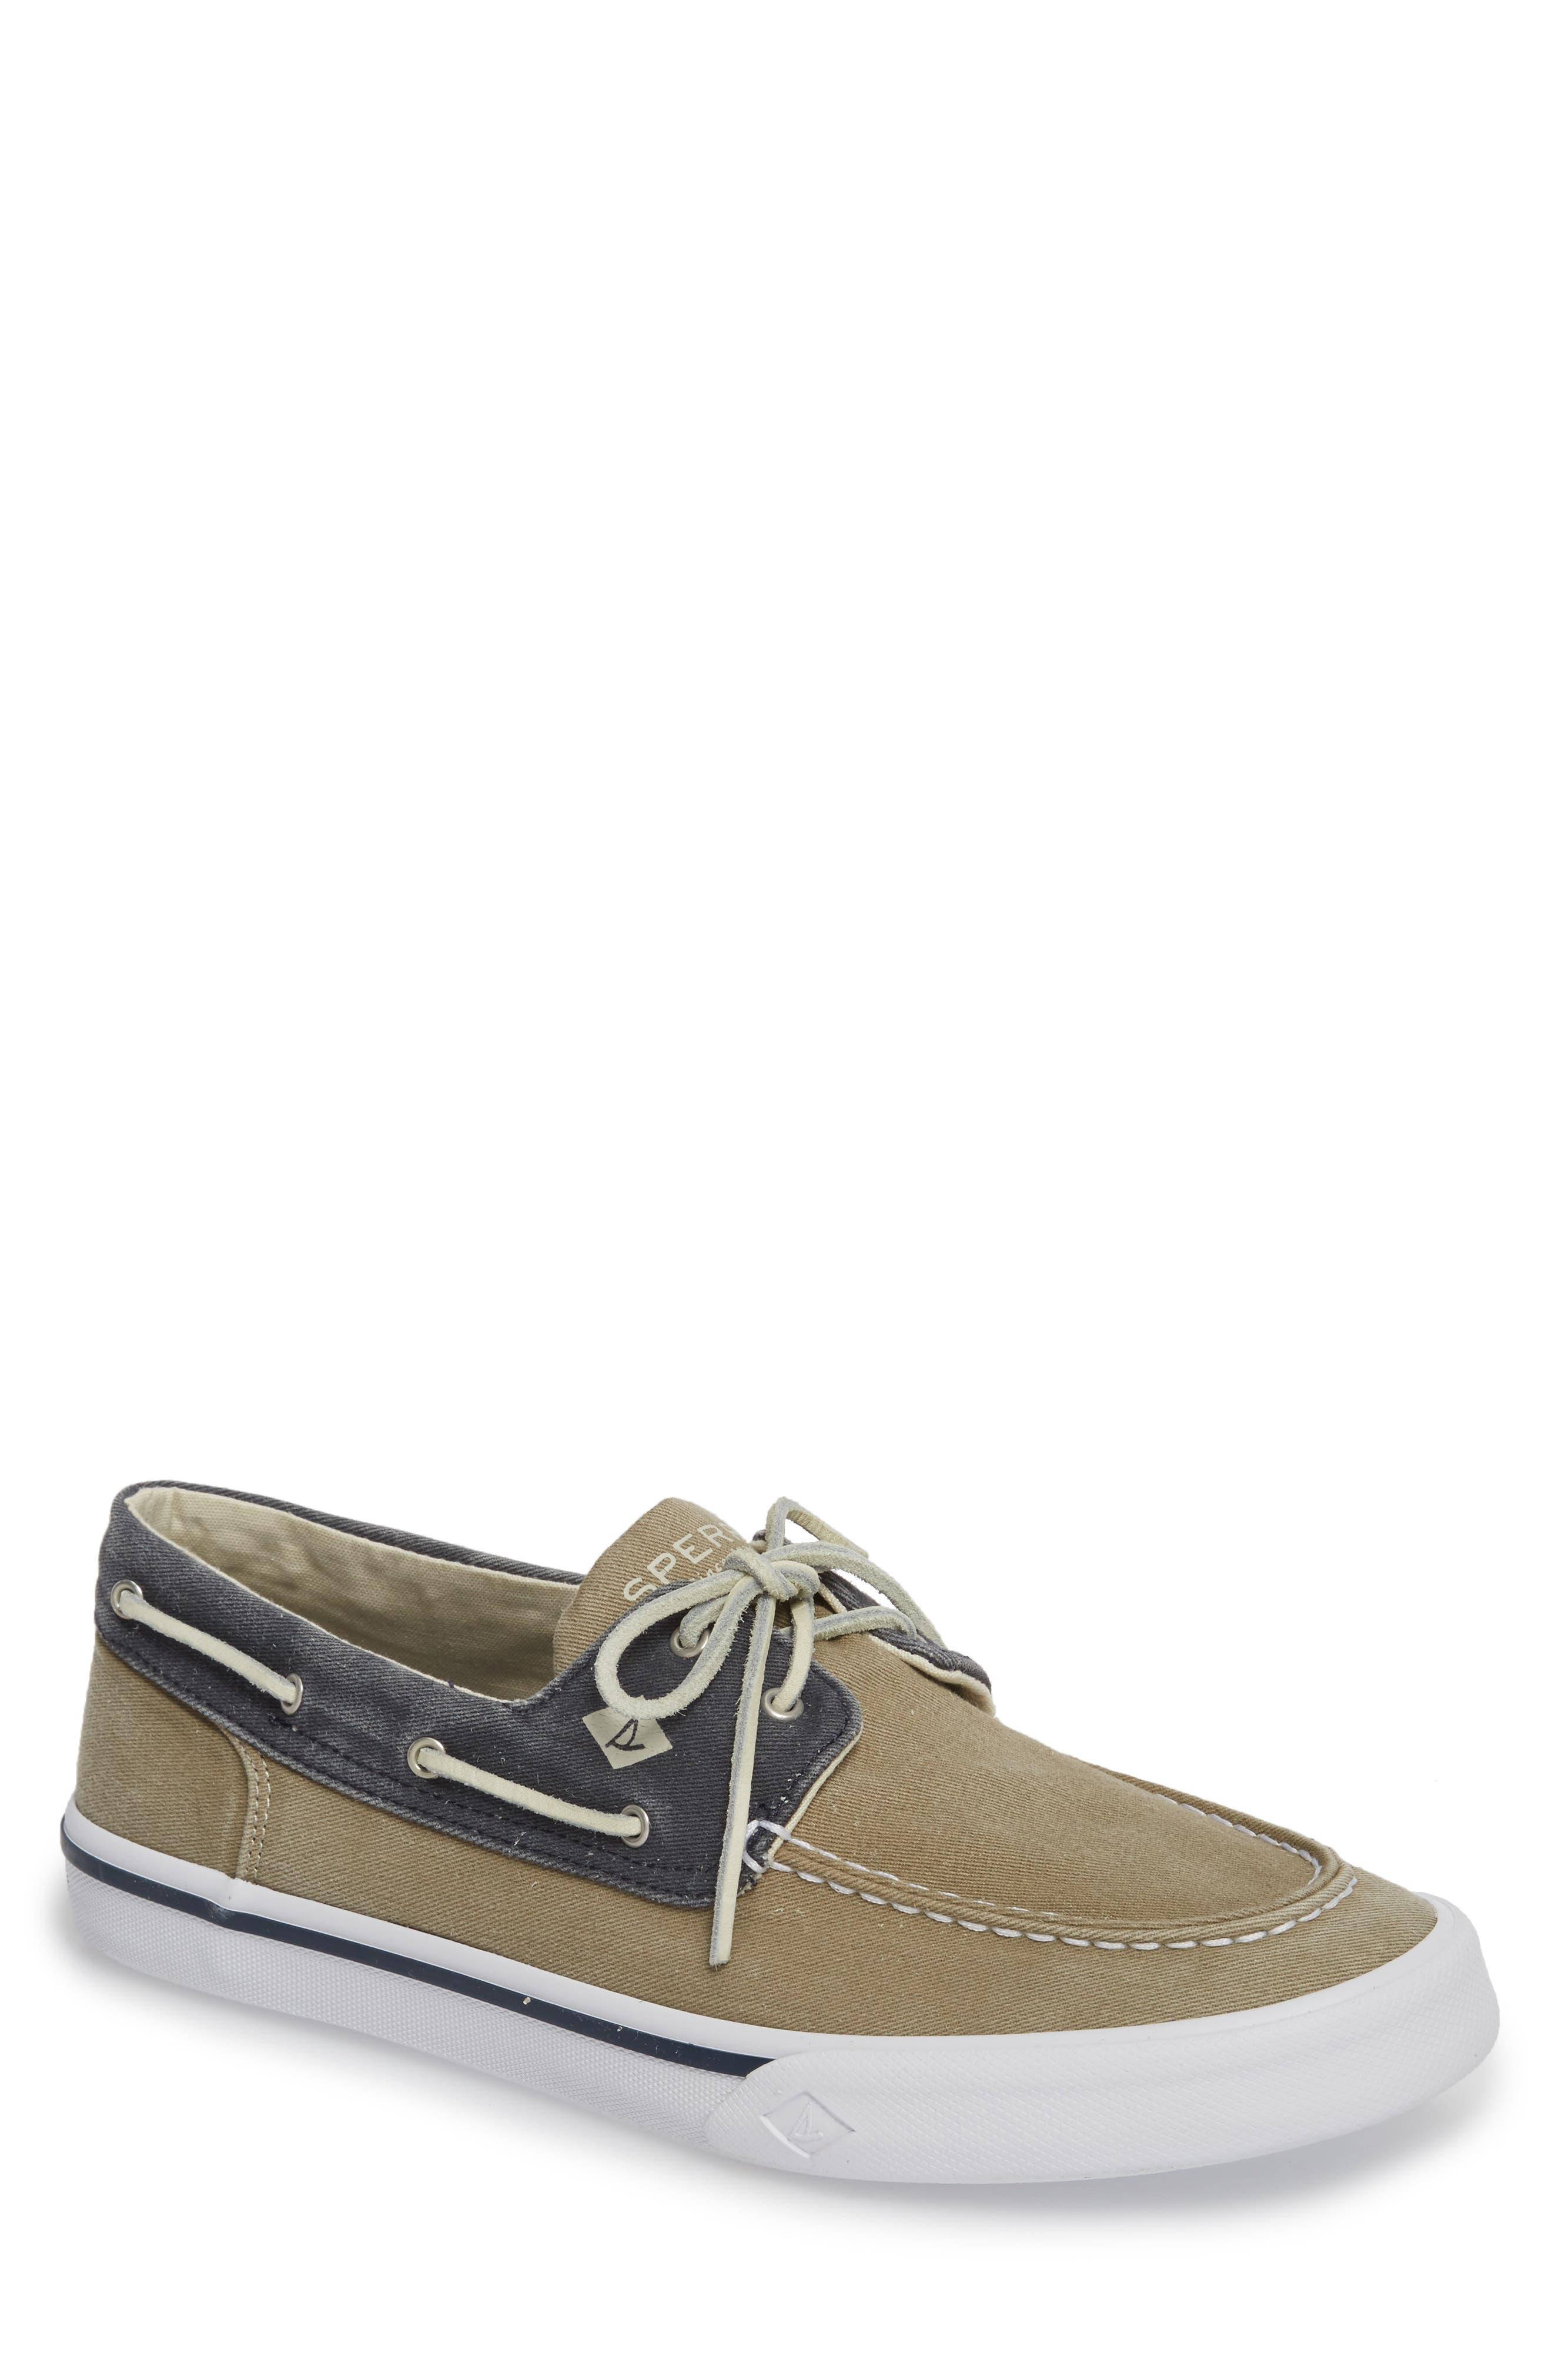 Striper II Boat Shoe,                             Main thumbnail 1, color,